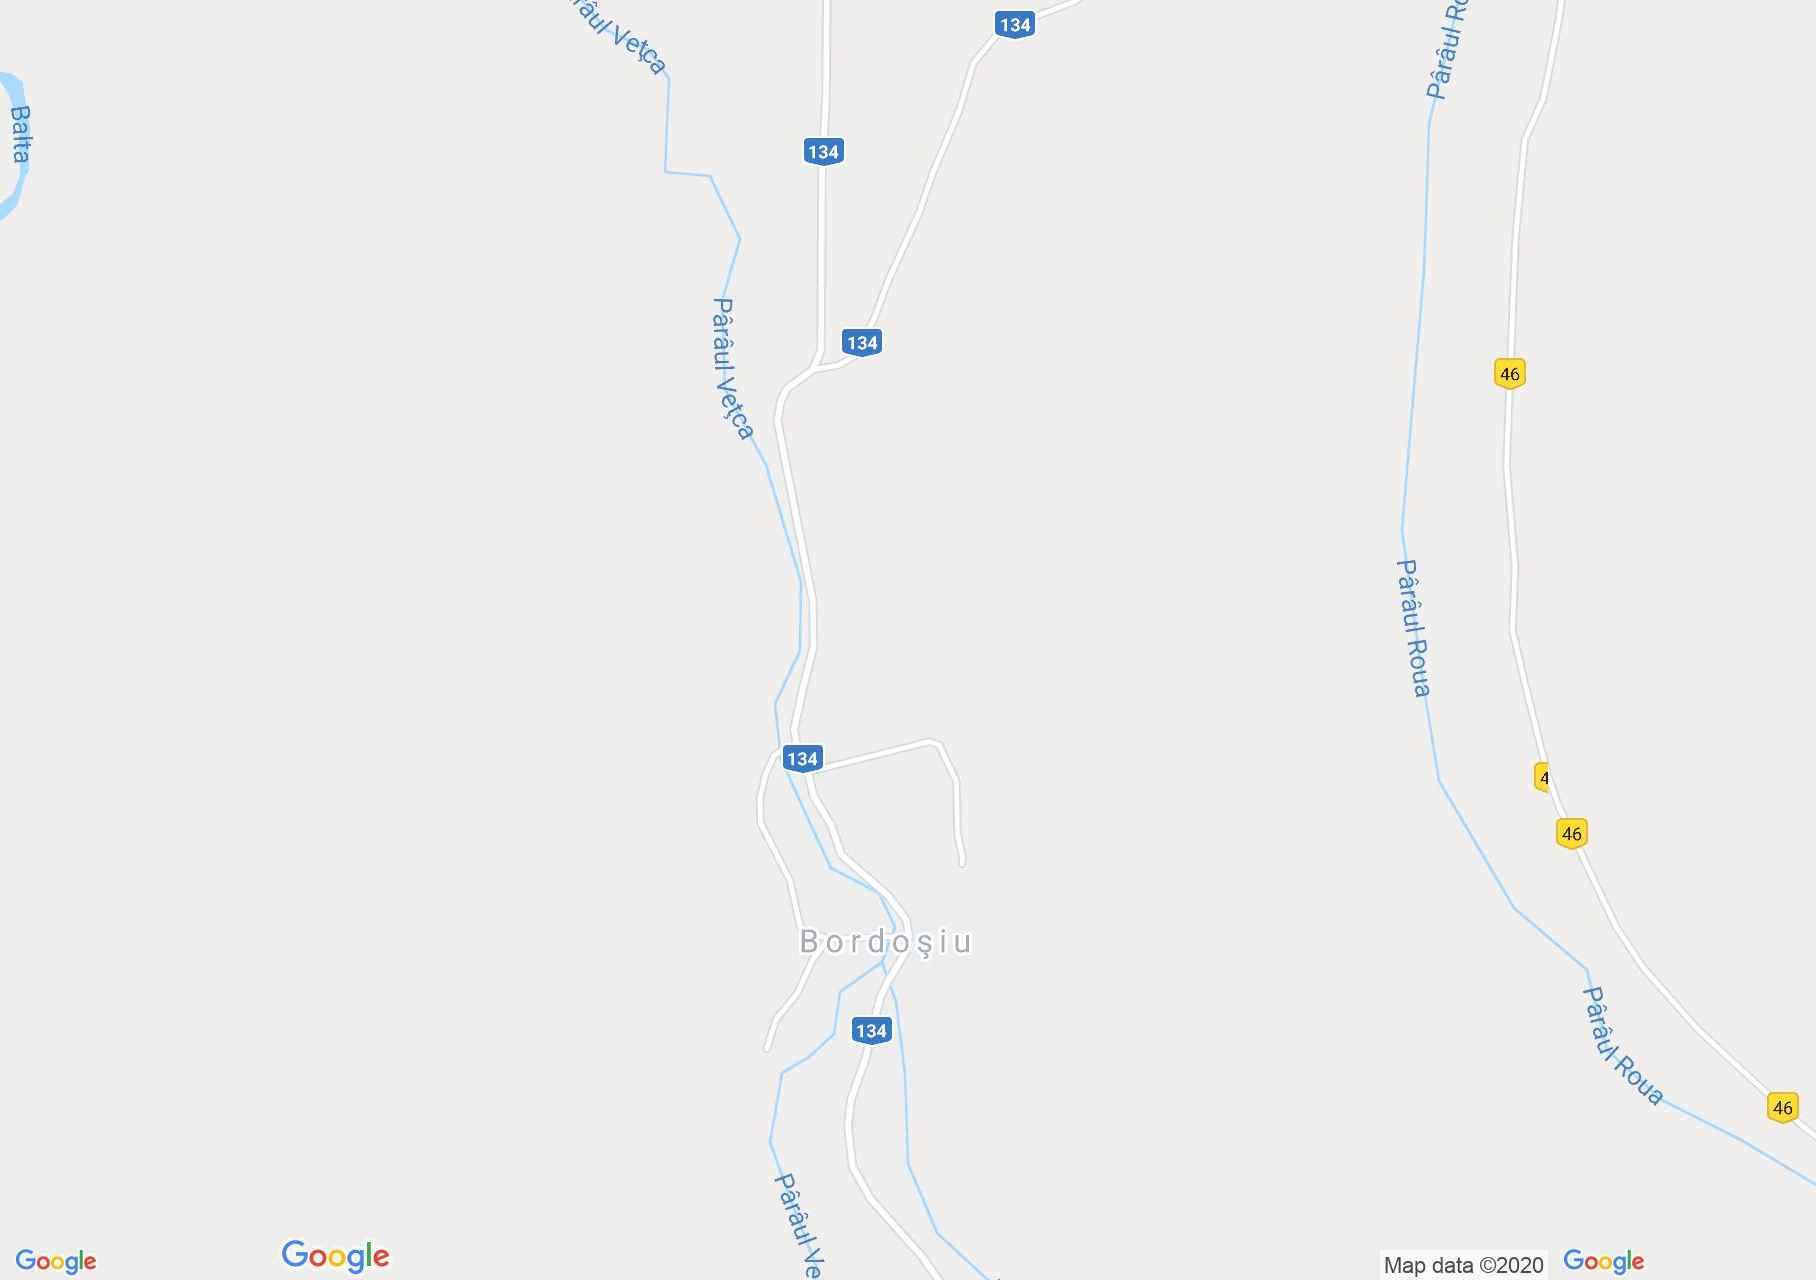 Map of Bordoşiu